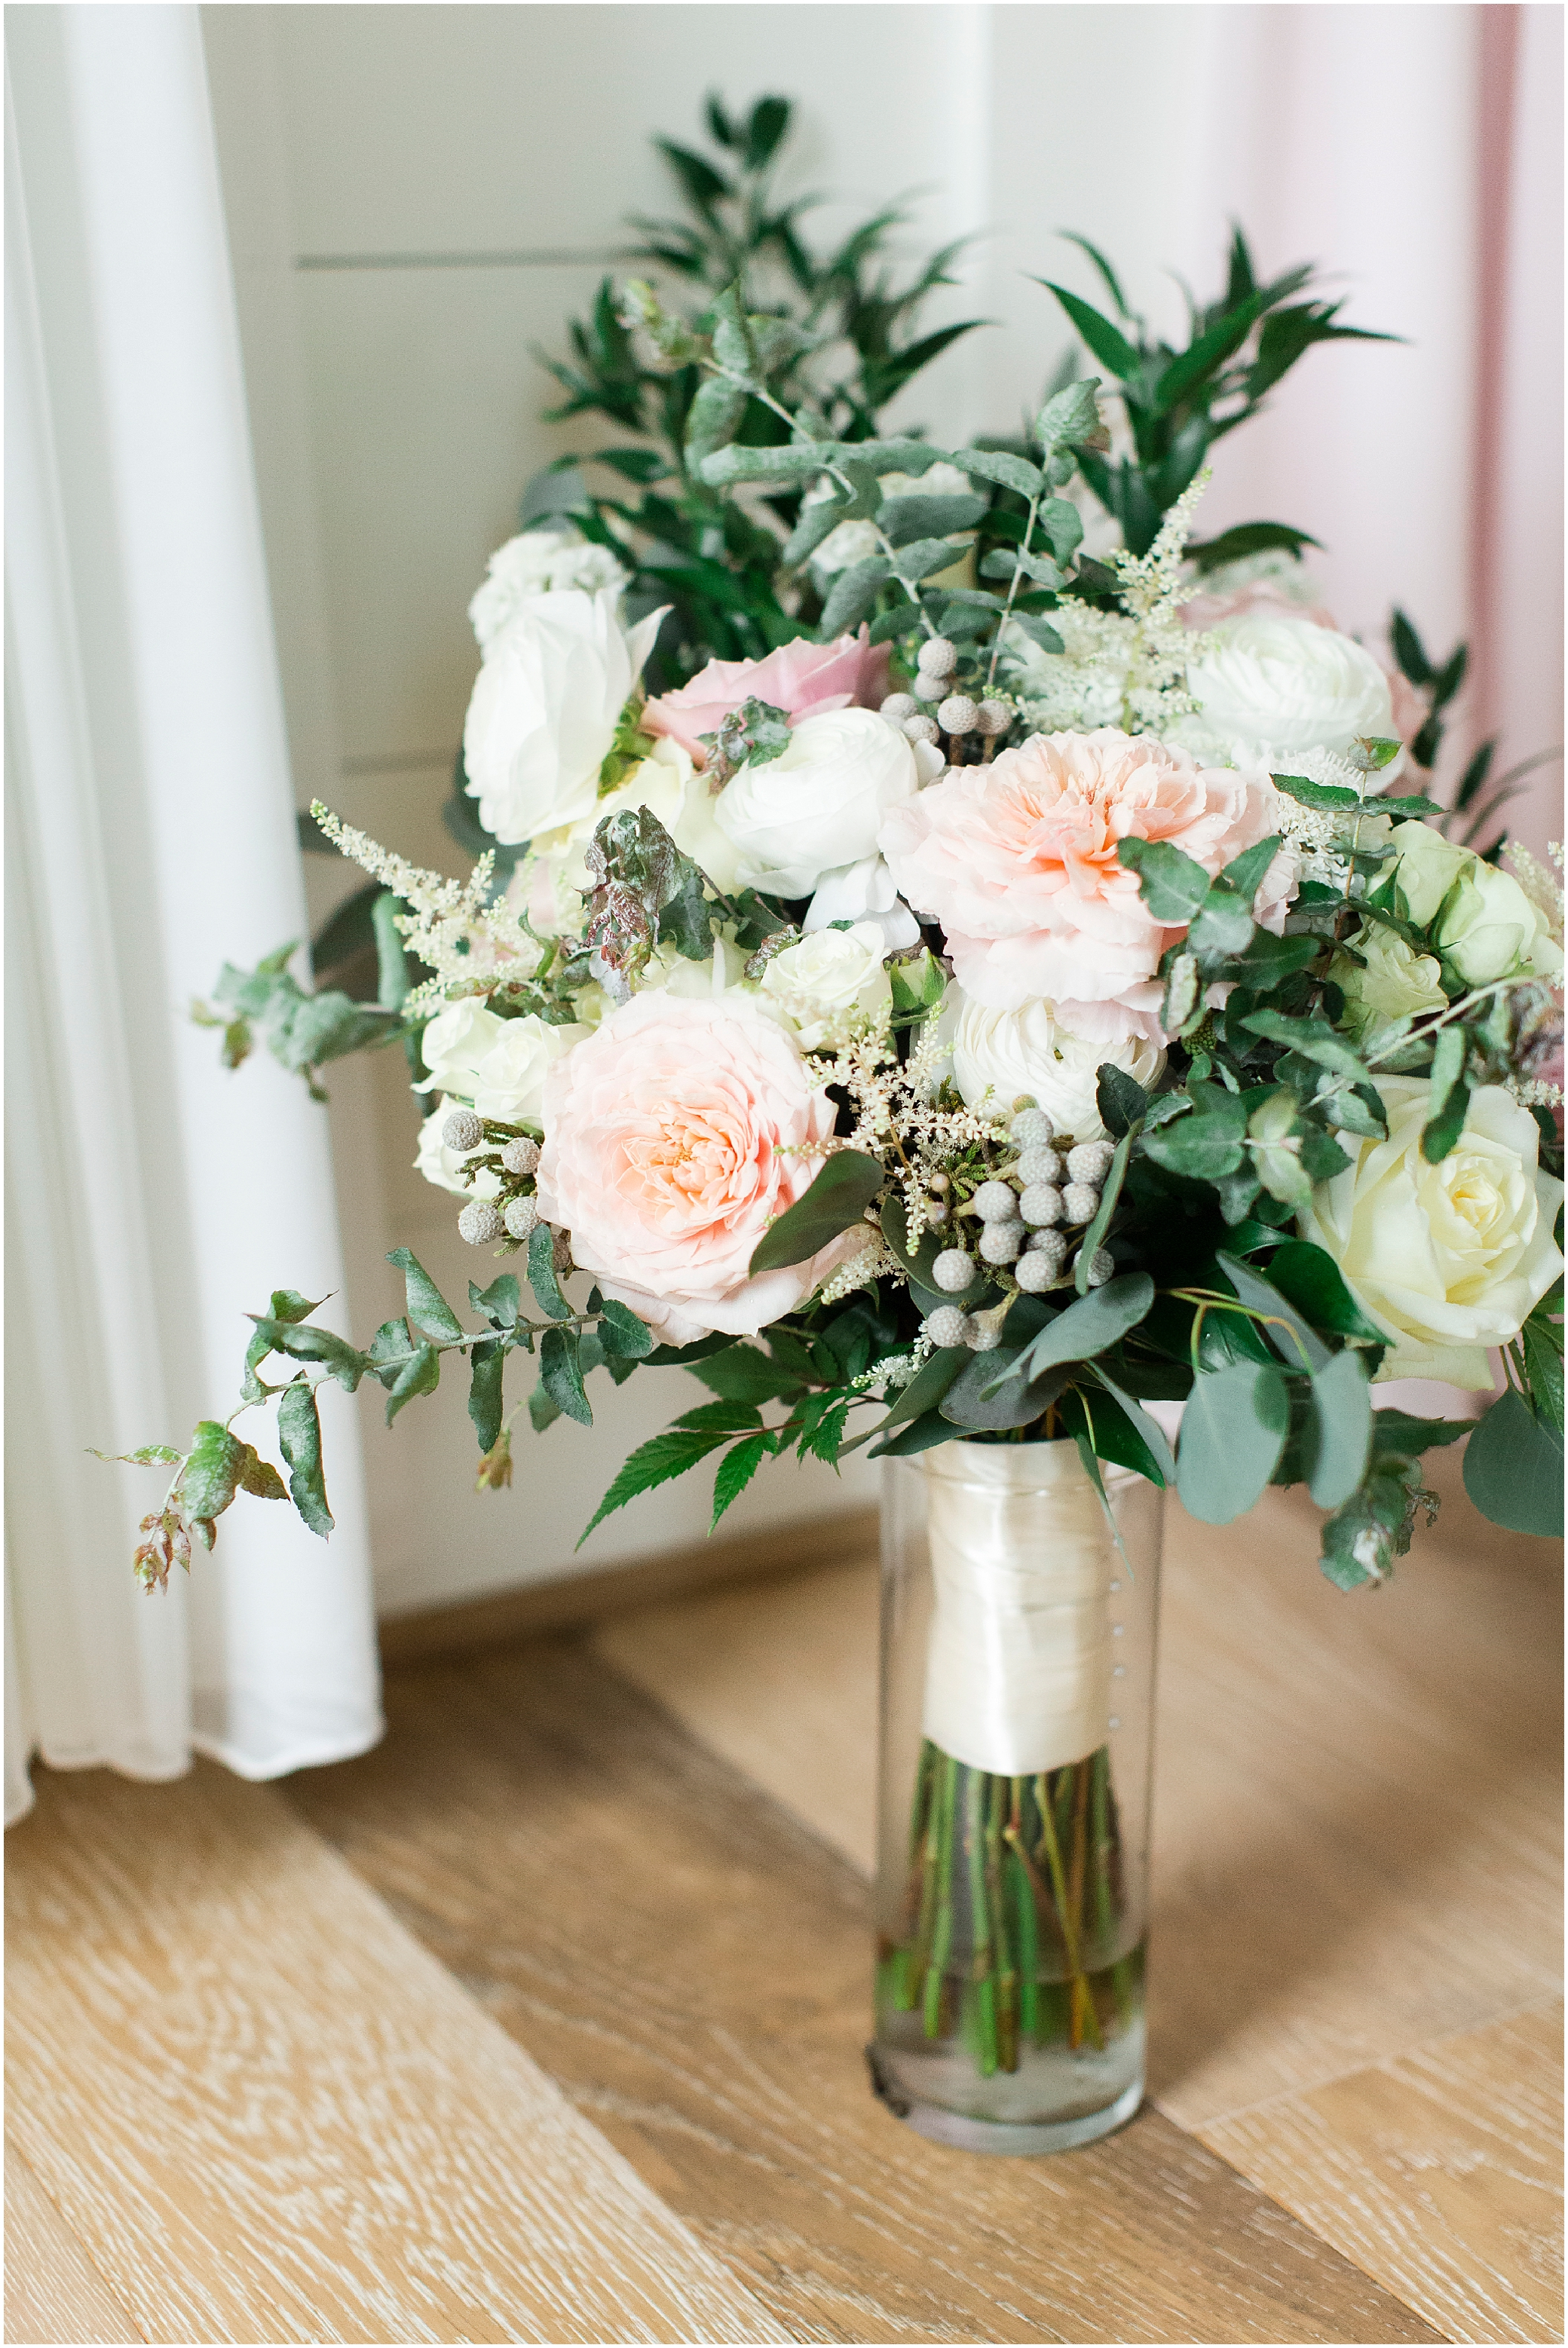 Bloom by Doyle's wedding bouquet at sierra vista